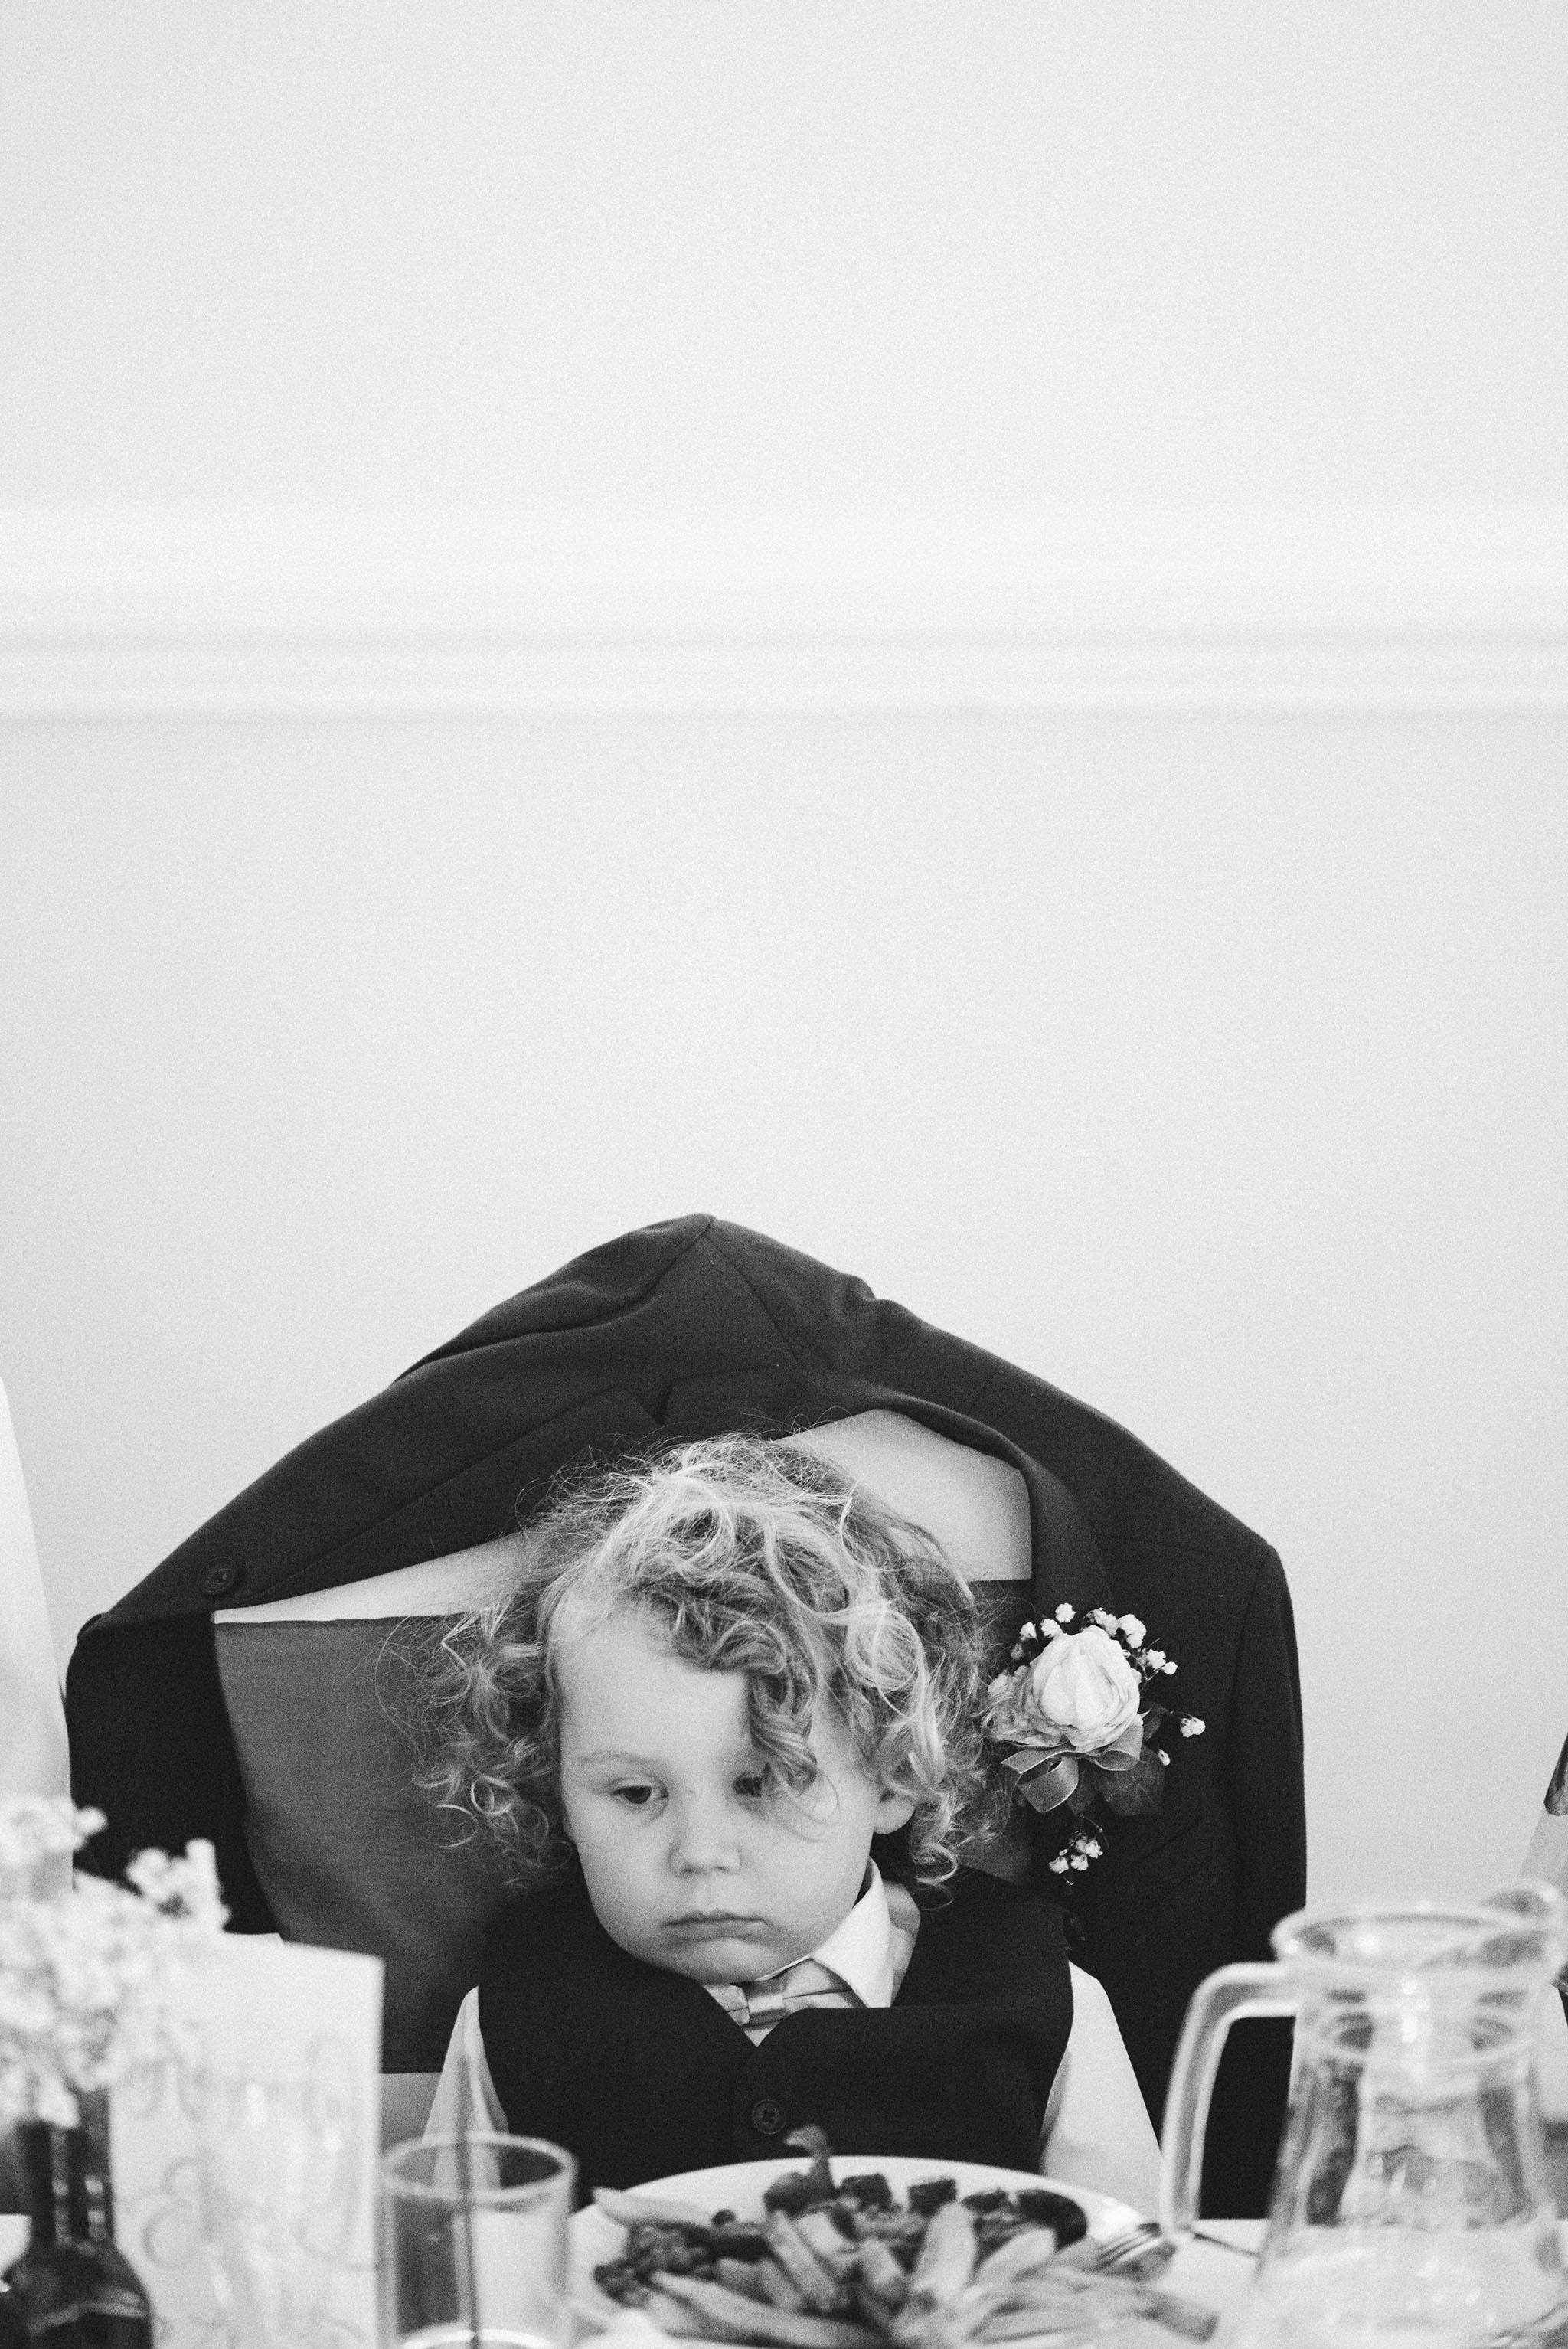 scott-stockwell-photography-wedding-21.jpg